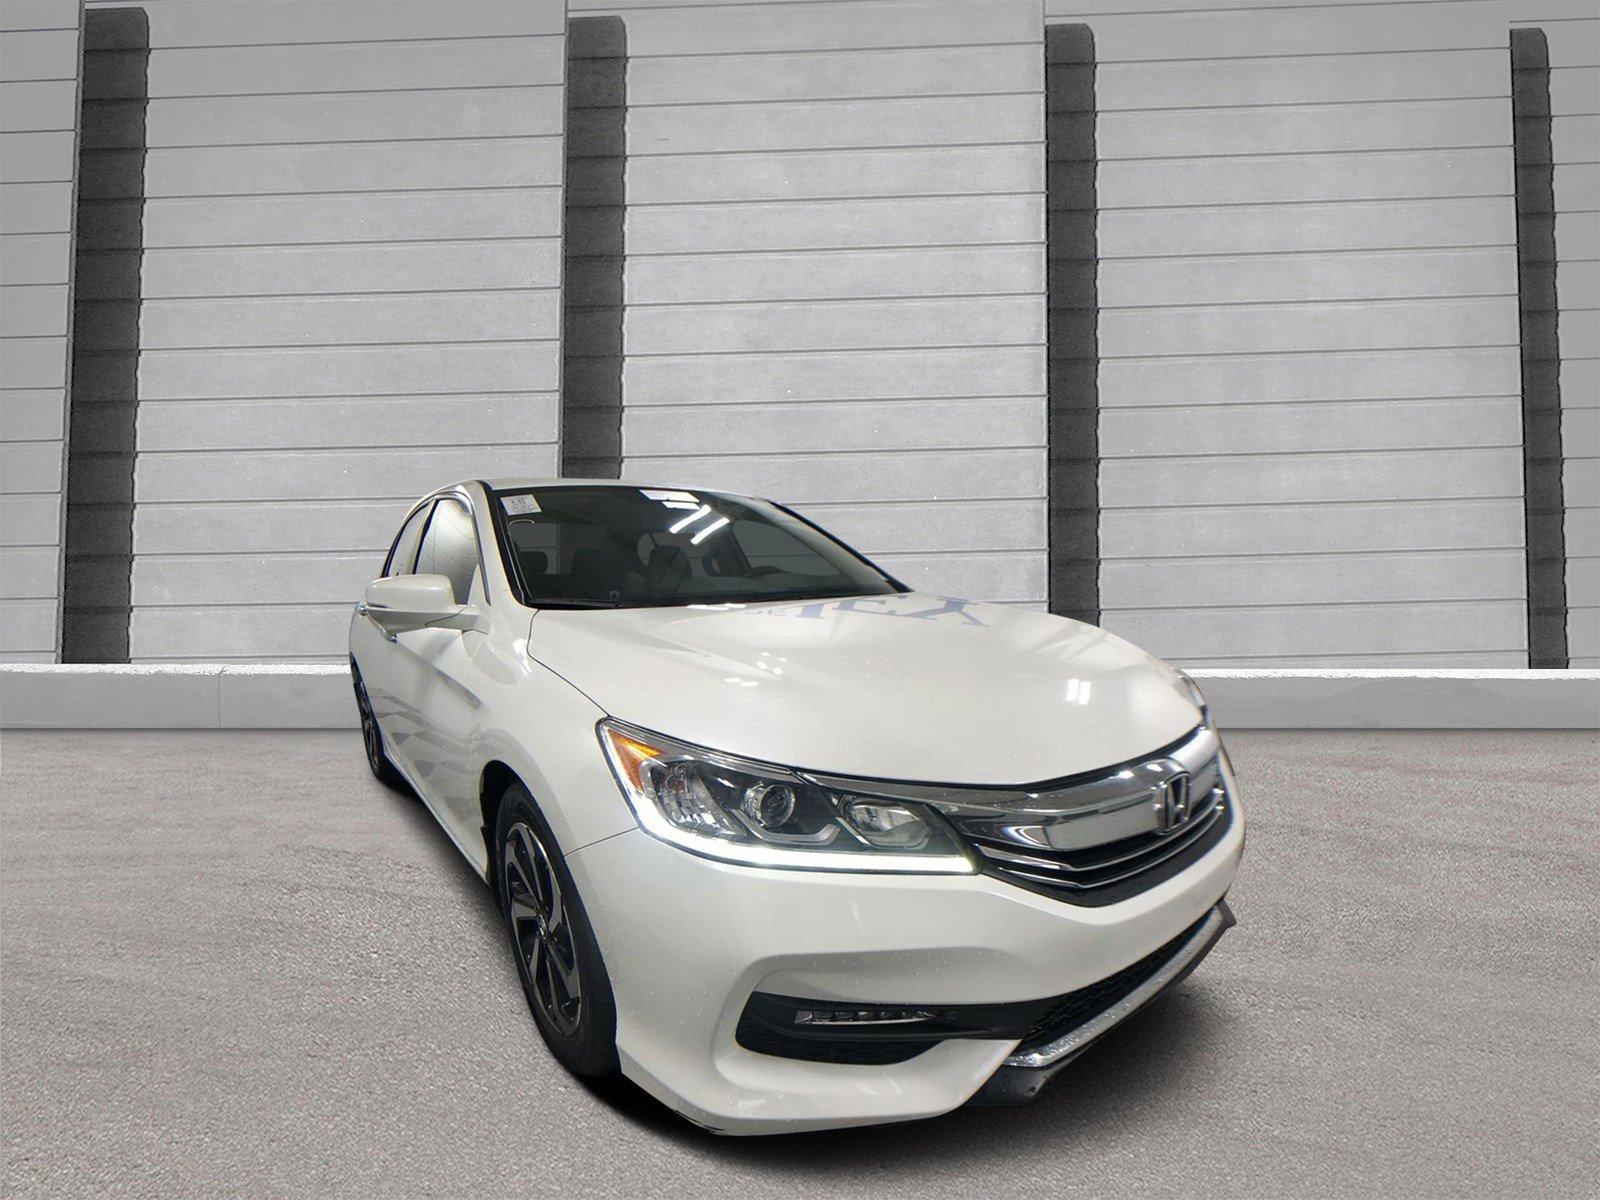 Pre-Owned 2017 Honda Accord Sedan EX